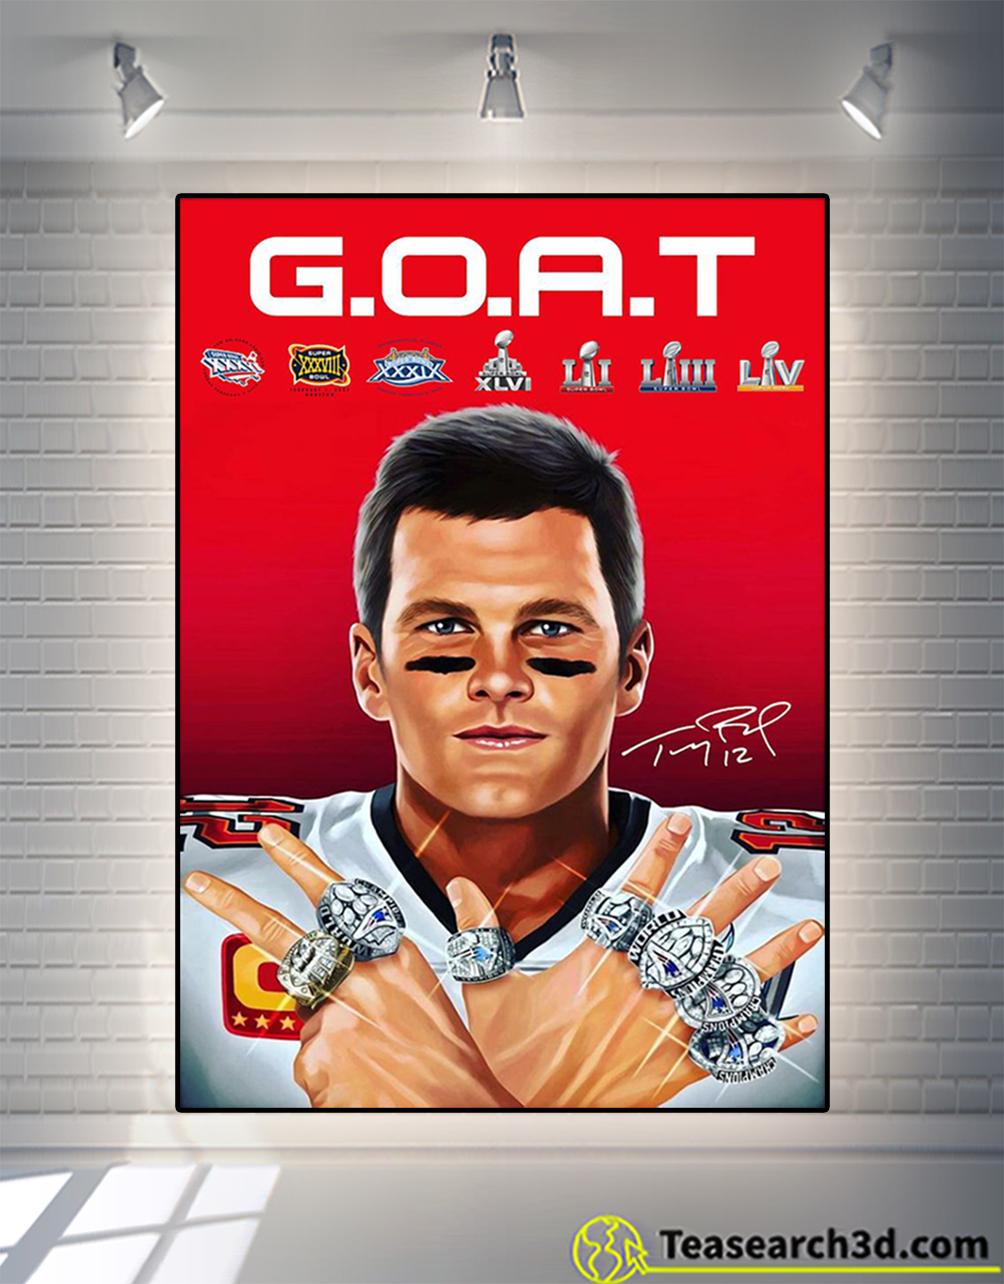 Tom Brady 2021 goat signature poster